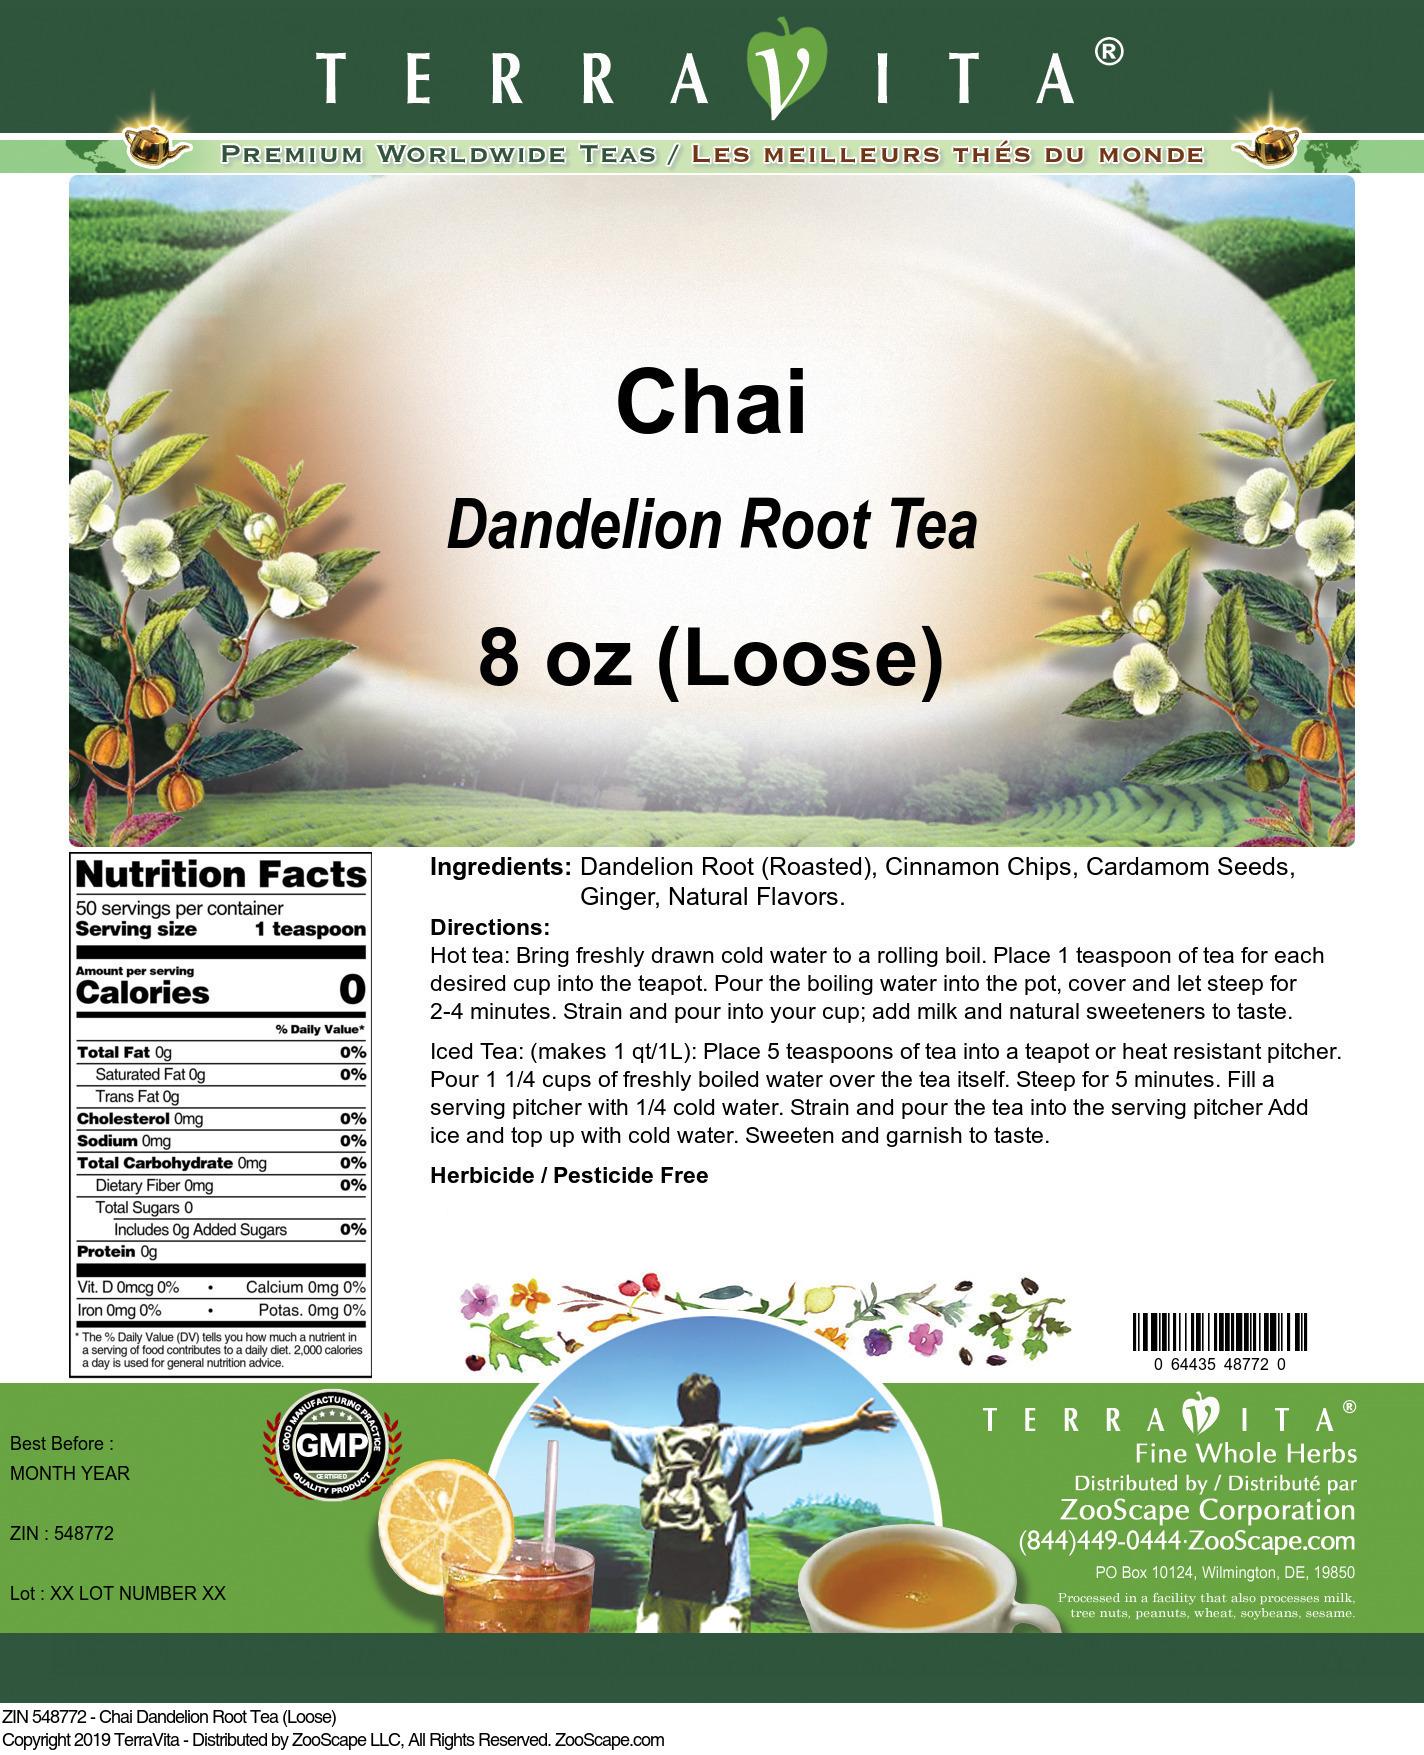 Chai Dandelion Root Tea (Loose)